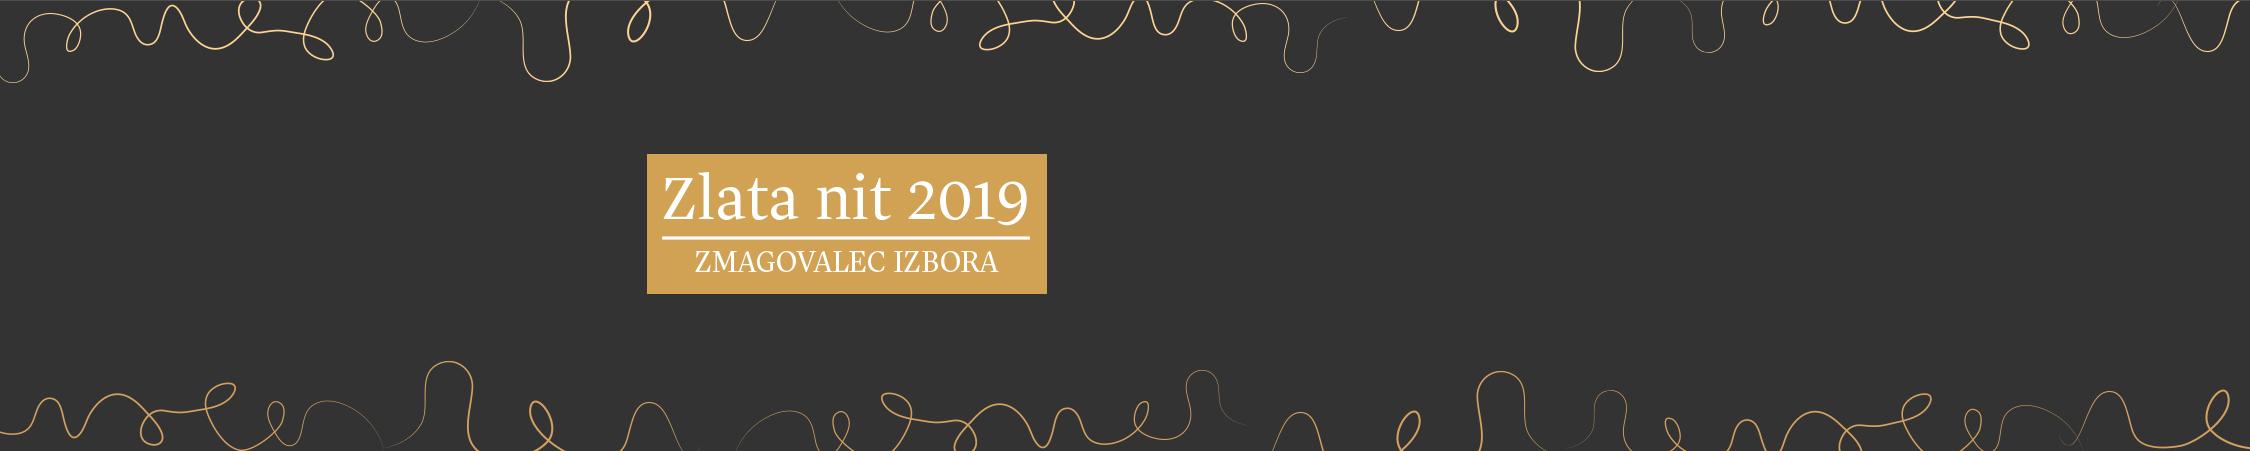 Winner Zlata nit 2019